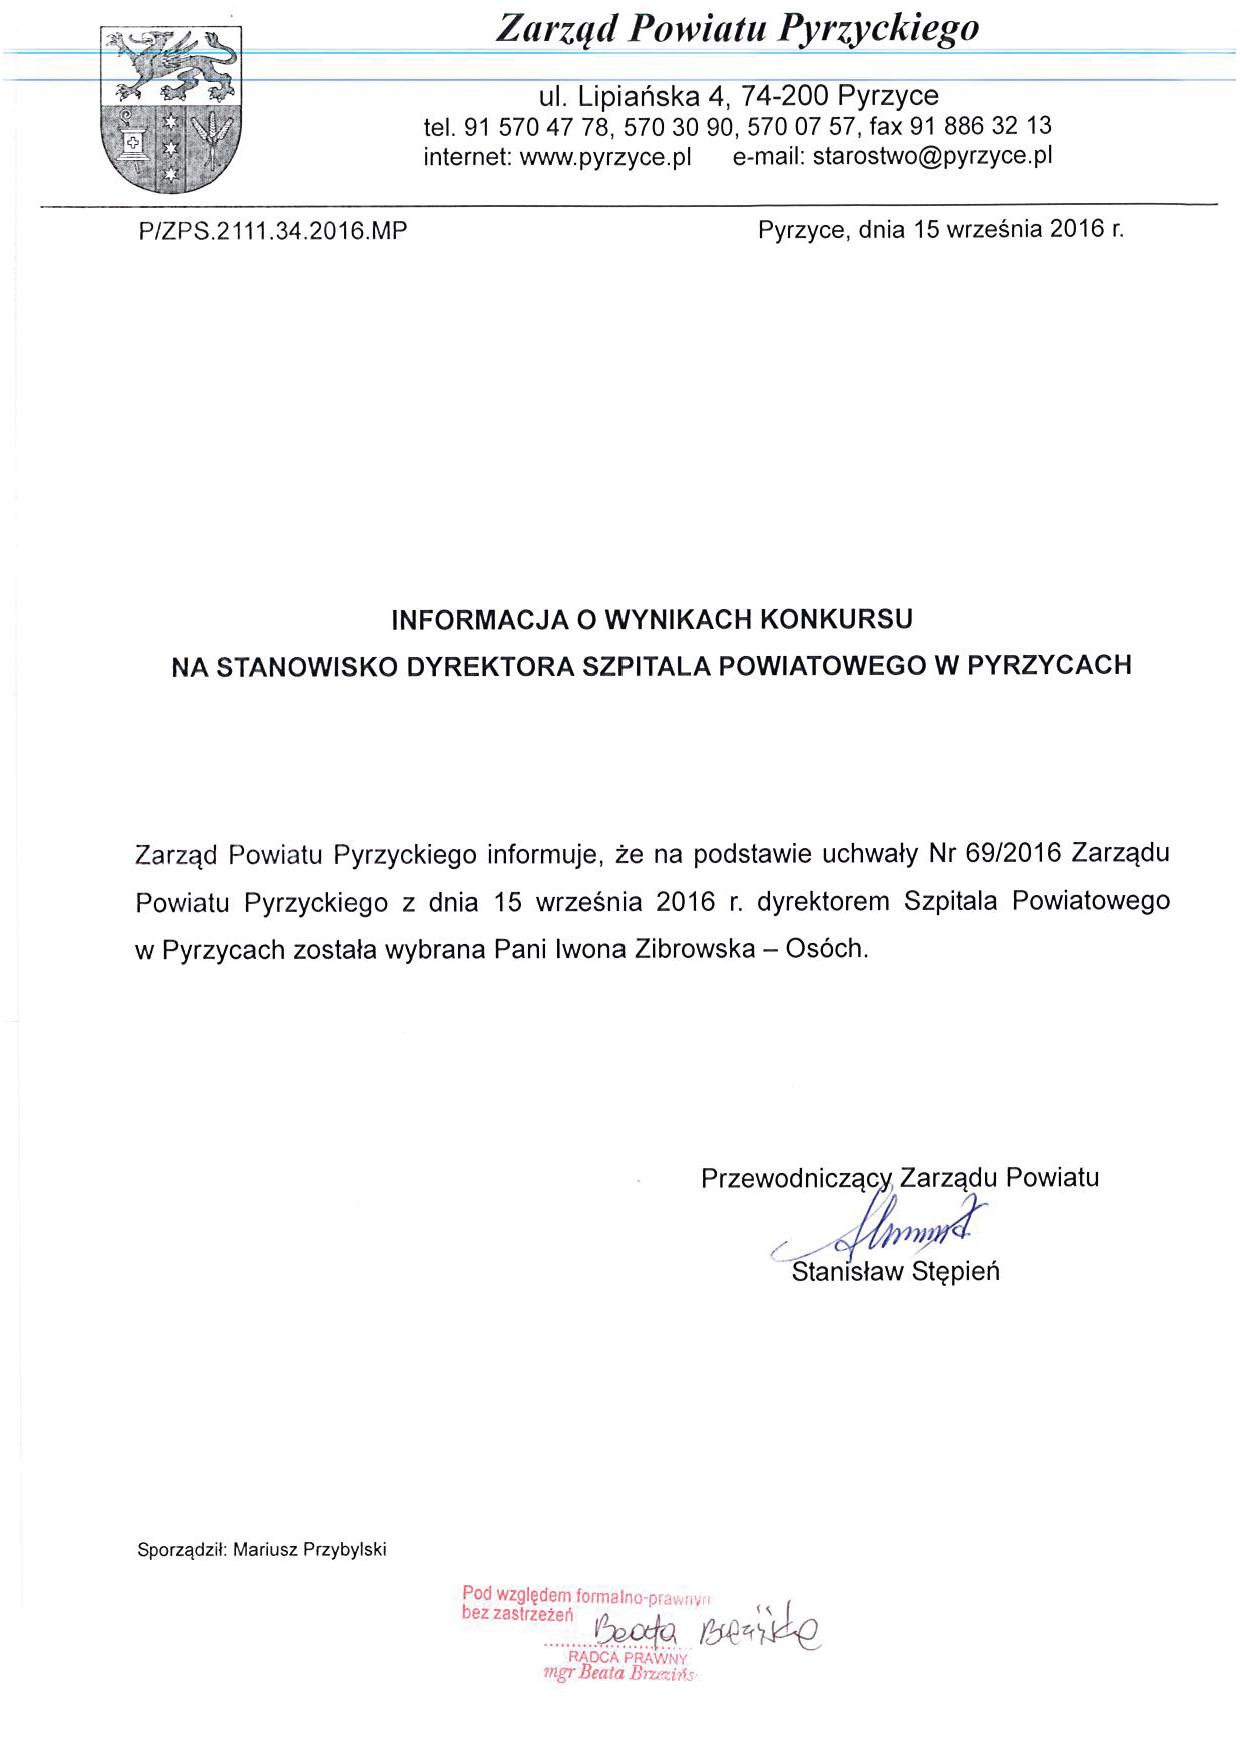 doc150916-15092016111535